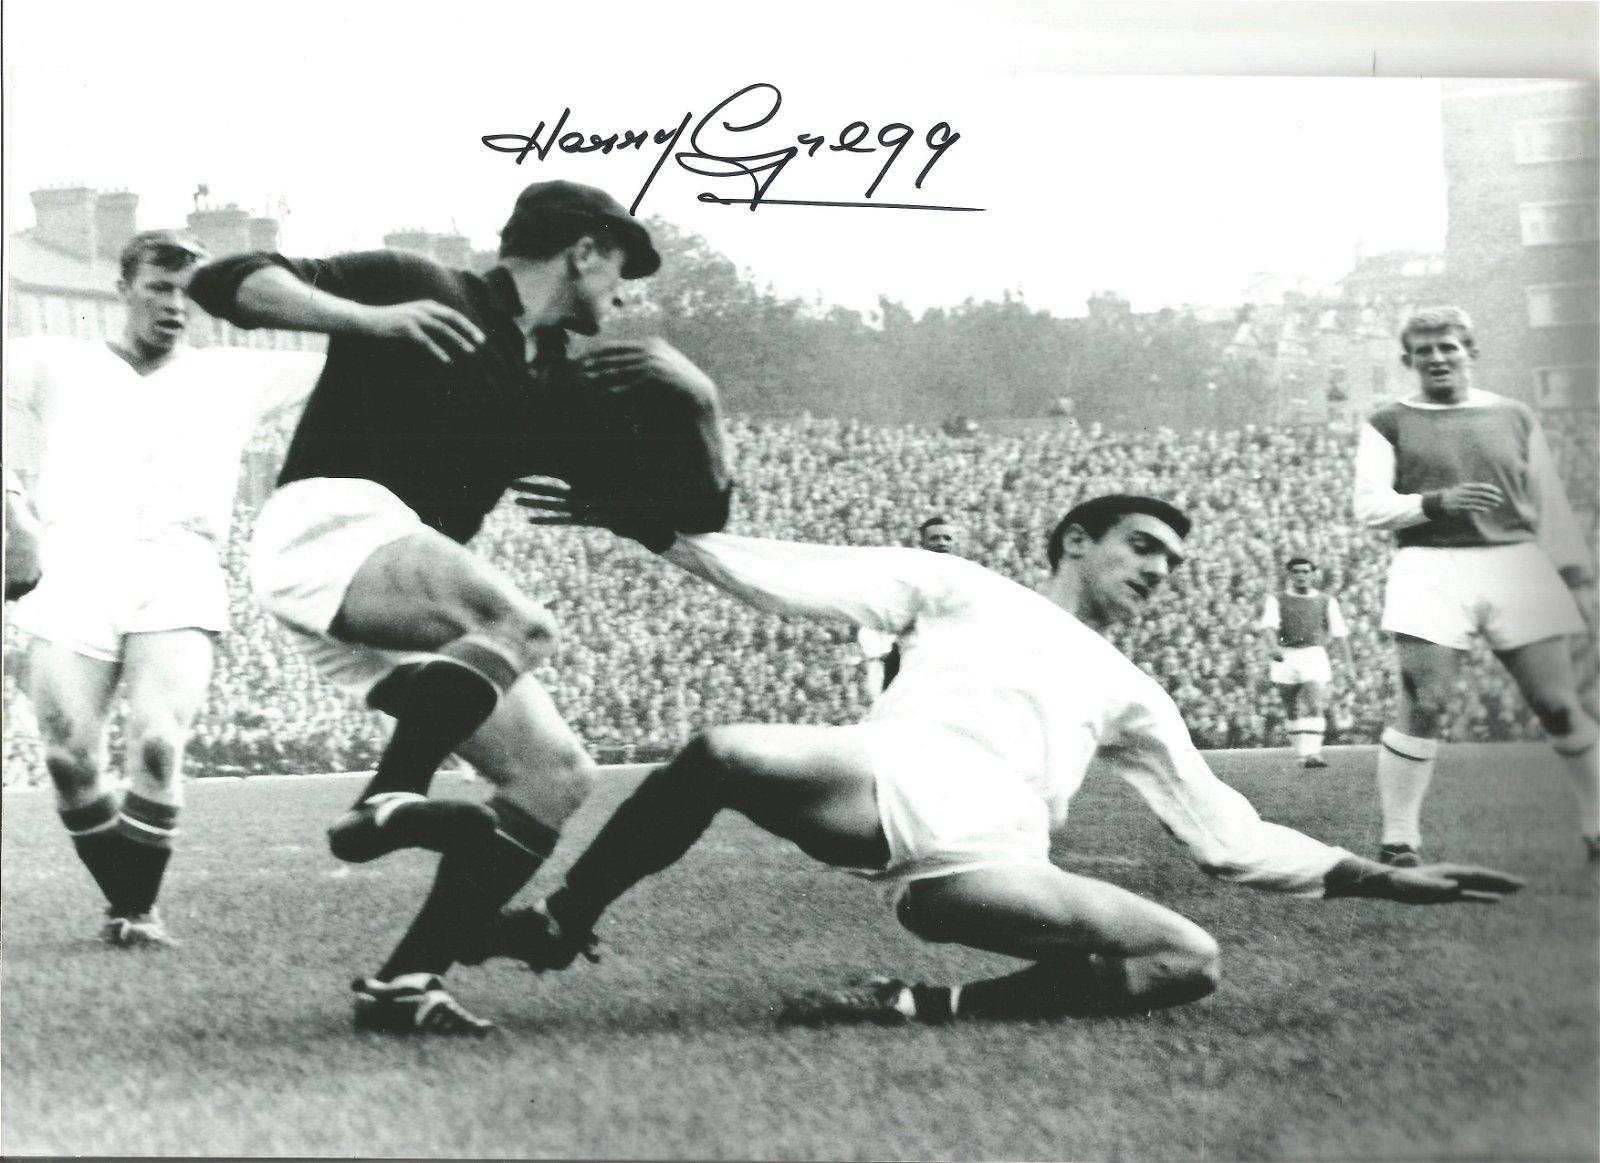 Harry Gregg Man United Signed 10 x 8 inch football